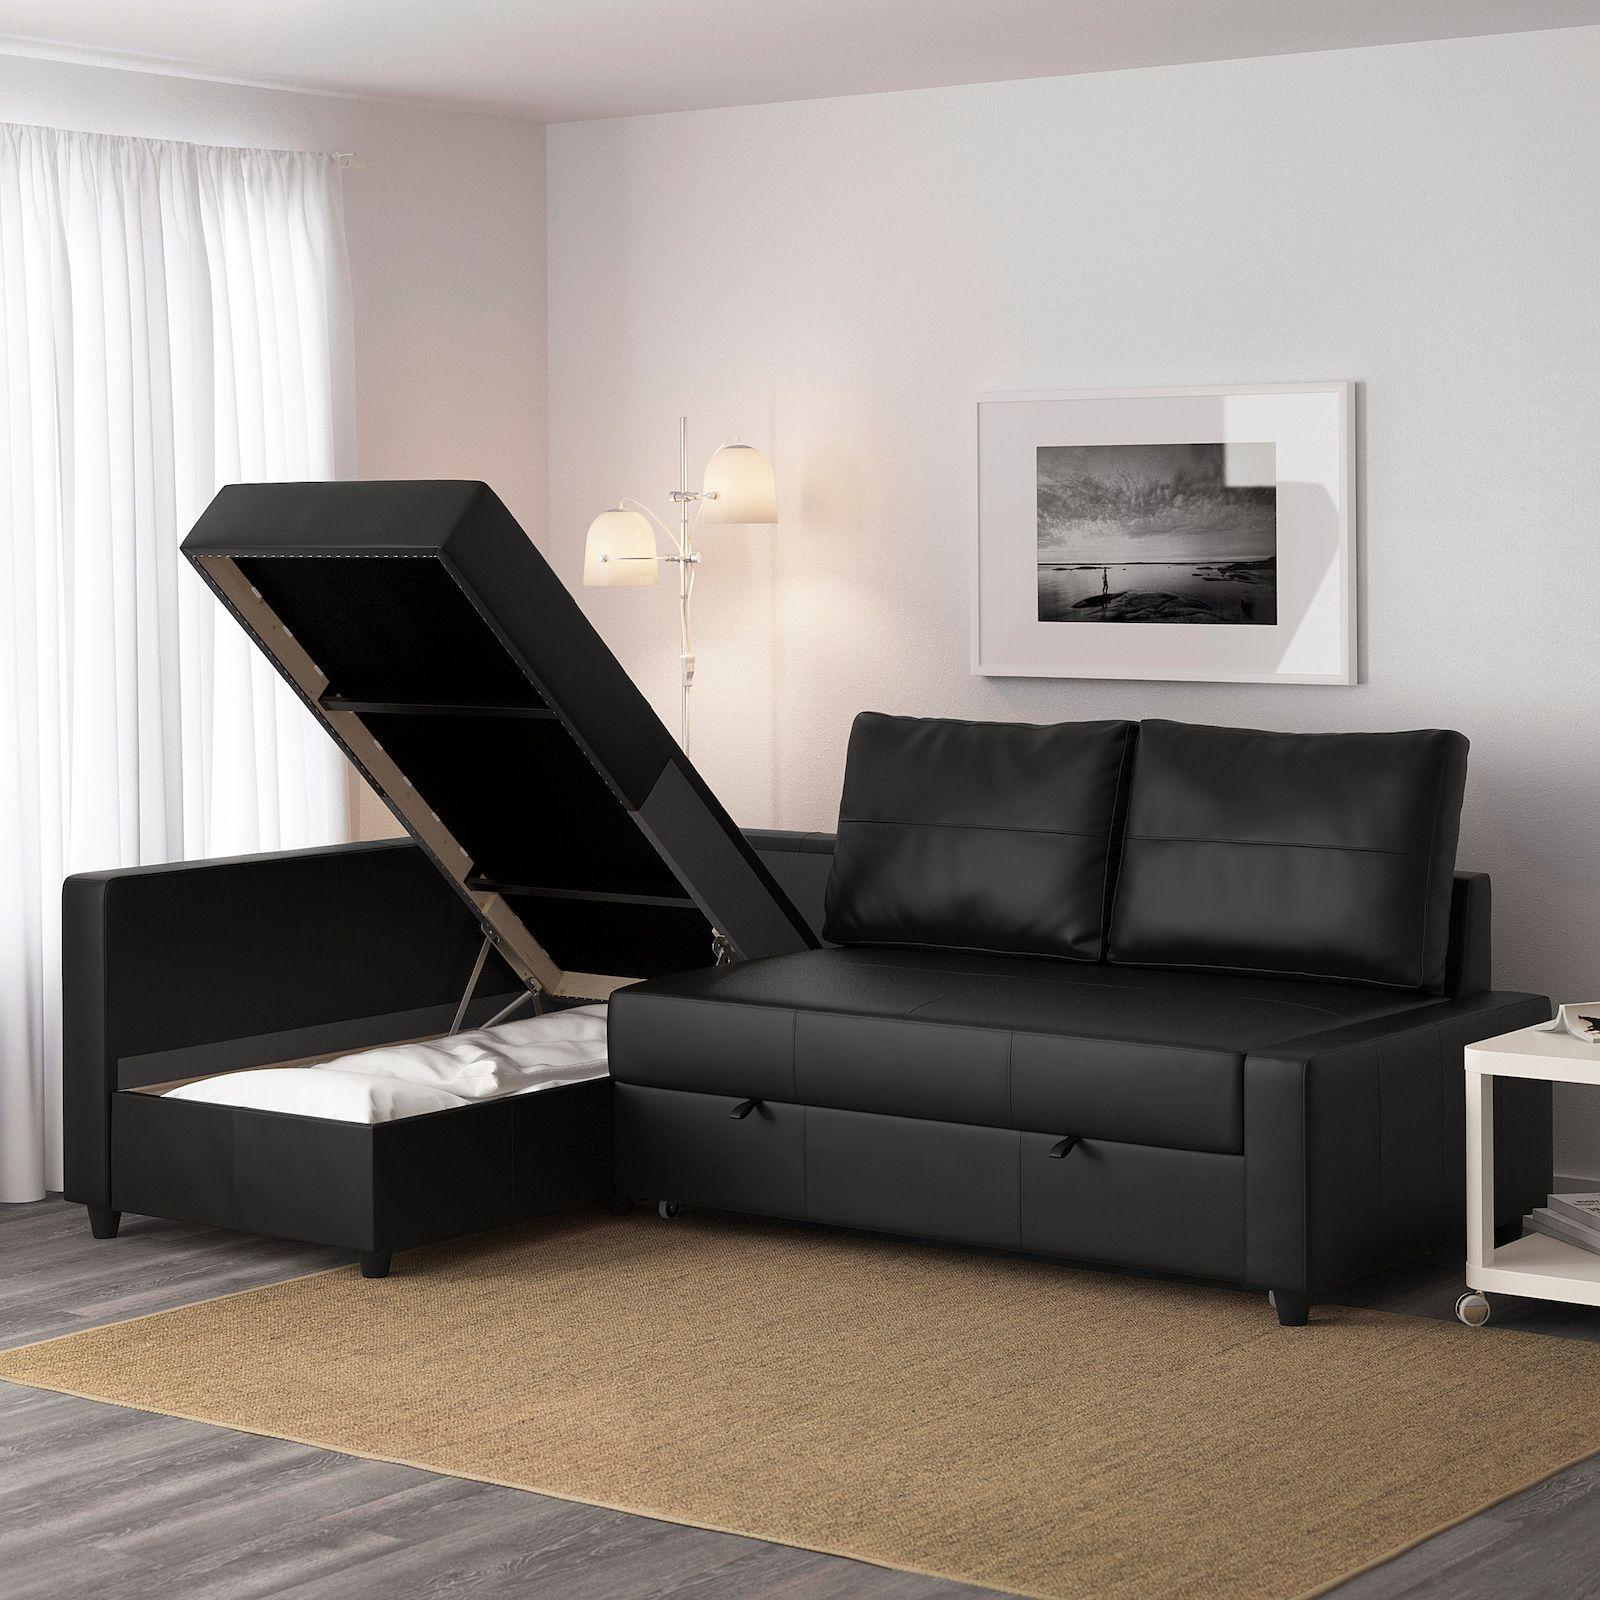 Friheten Sleeper Sectional 3 Seat W Storage Bomstad Black Ikea In 2020 Sofa Bed With Storage Corner Sofa Bed With Storage Ikea Sofa Bed